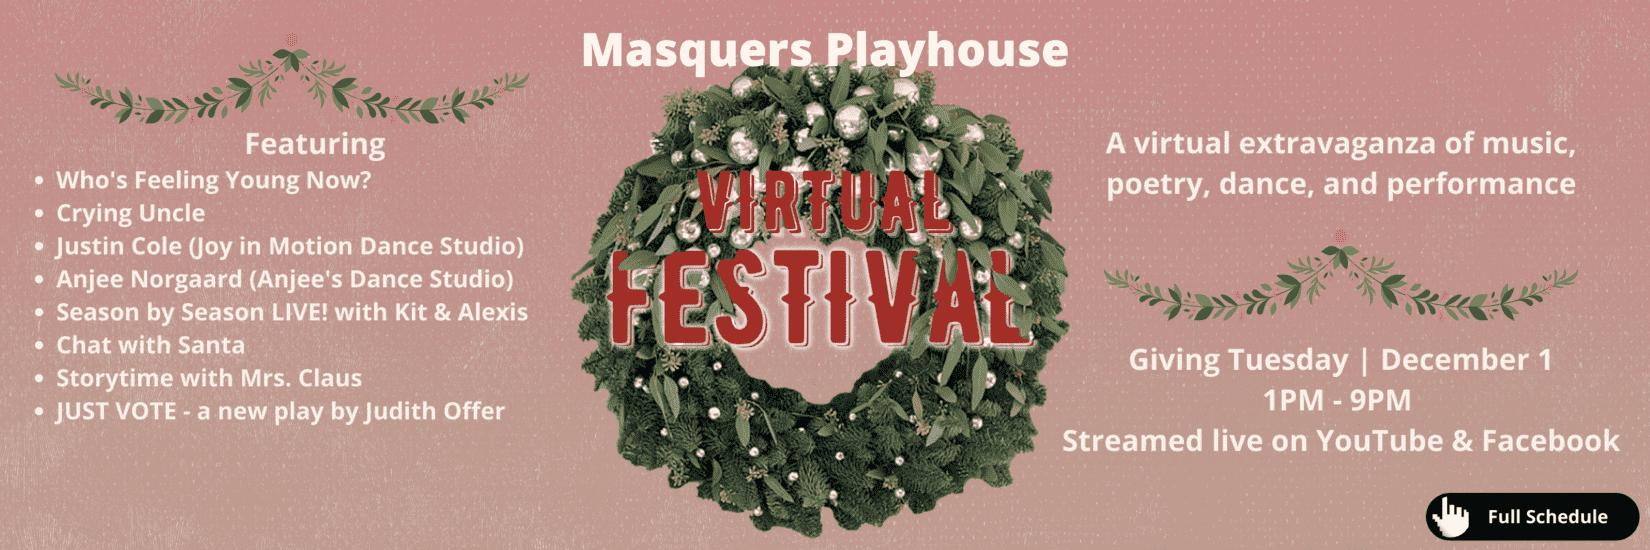 Masquers Playhouse Virtual Festival